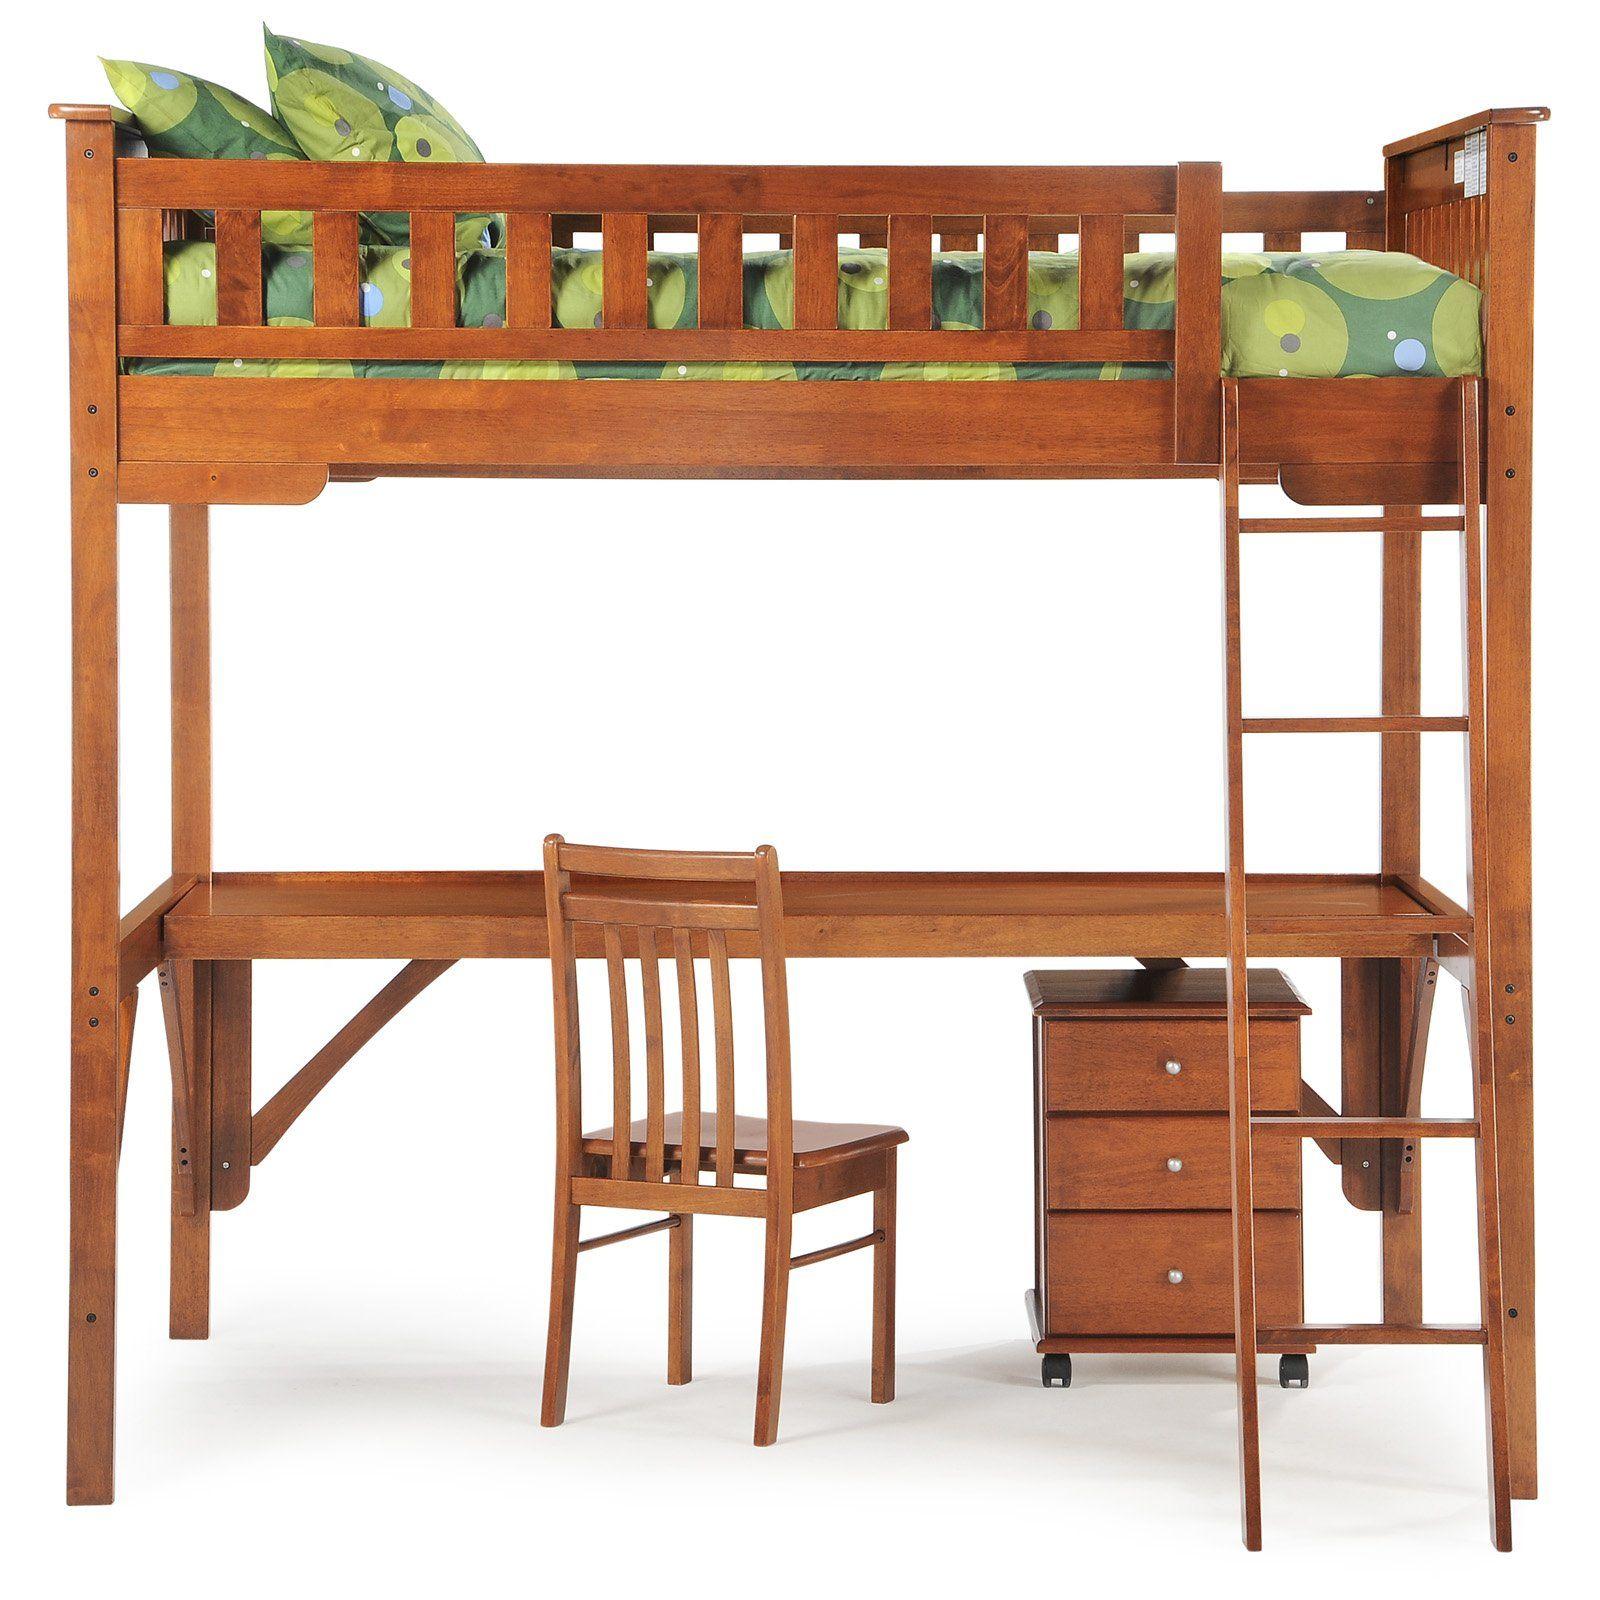 Ginger Loft - Loft Beds at Simply Bunk Beds